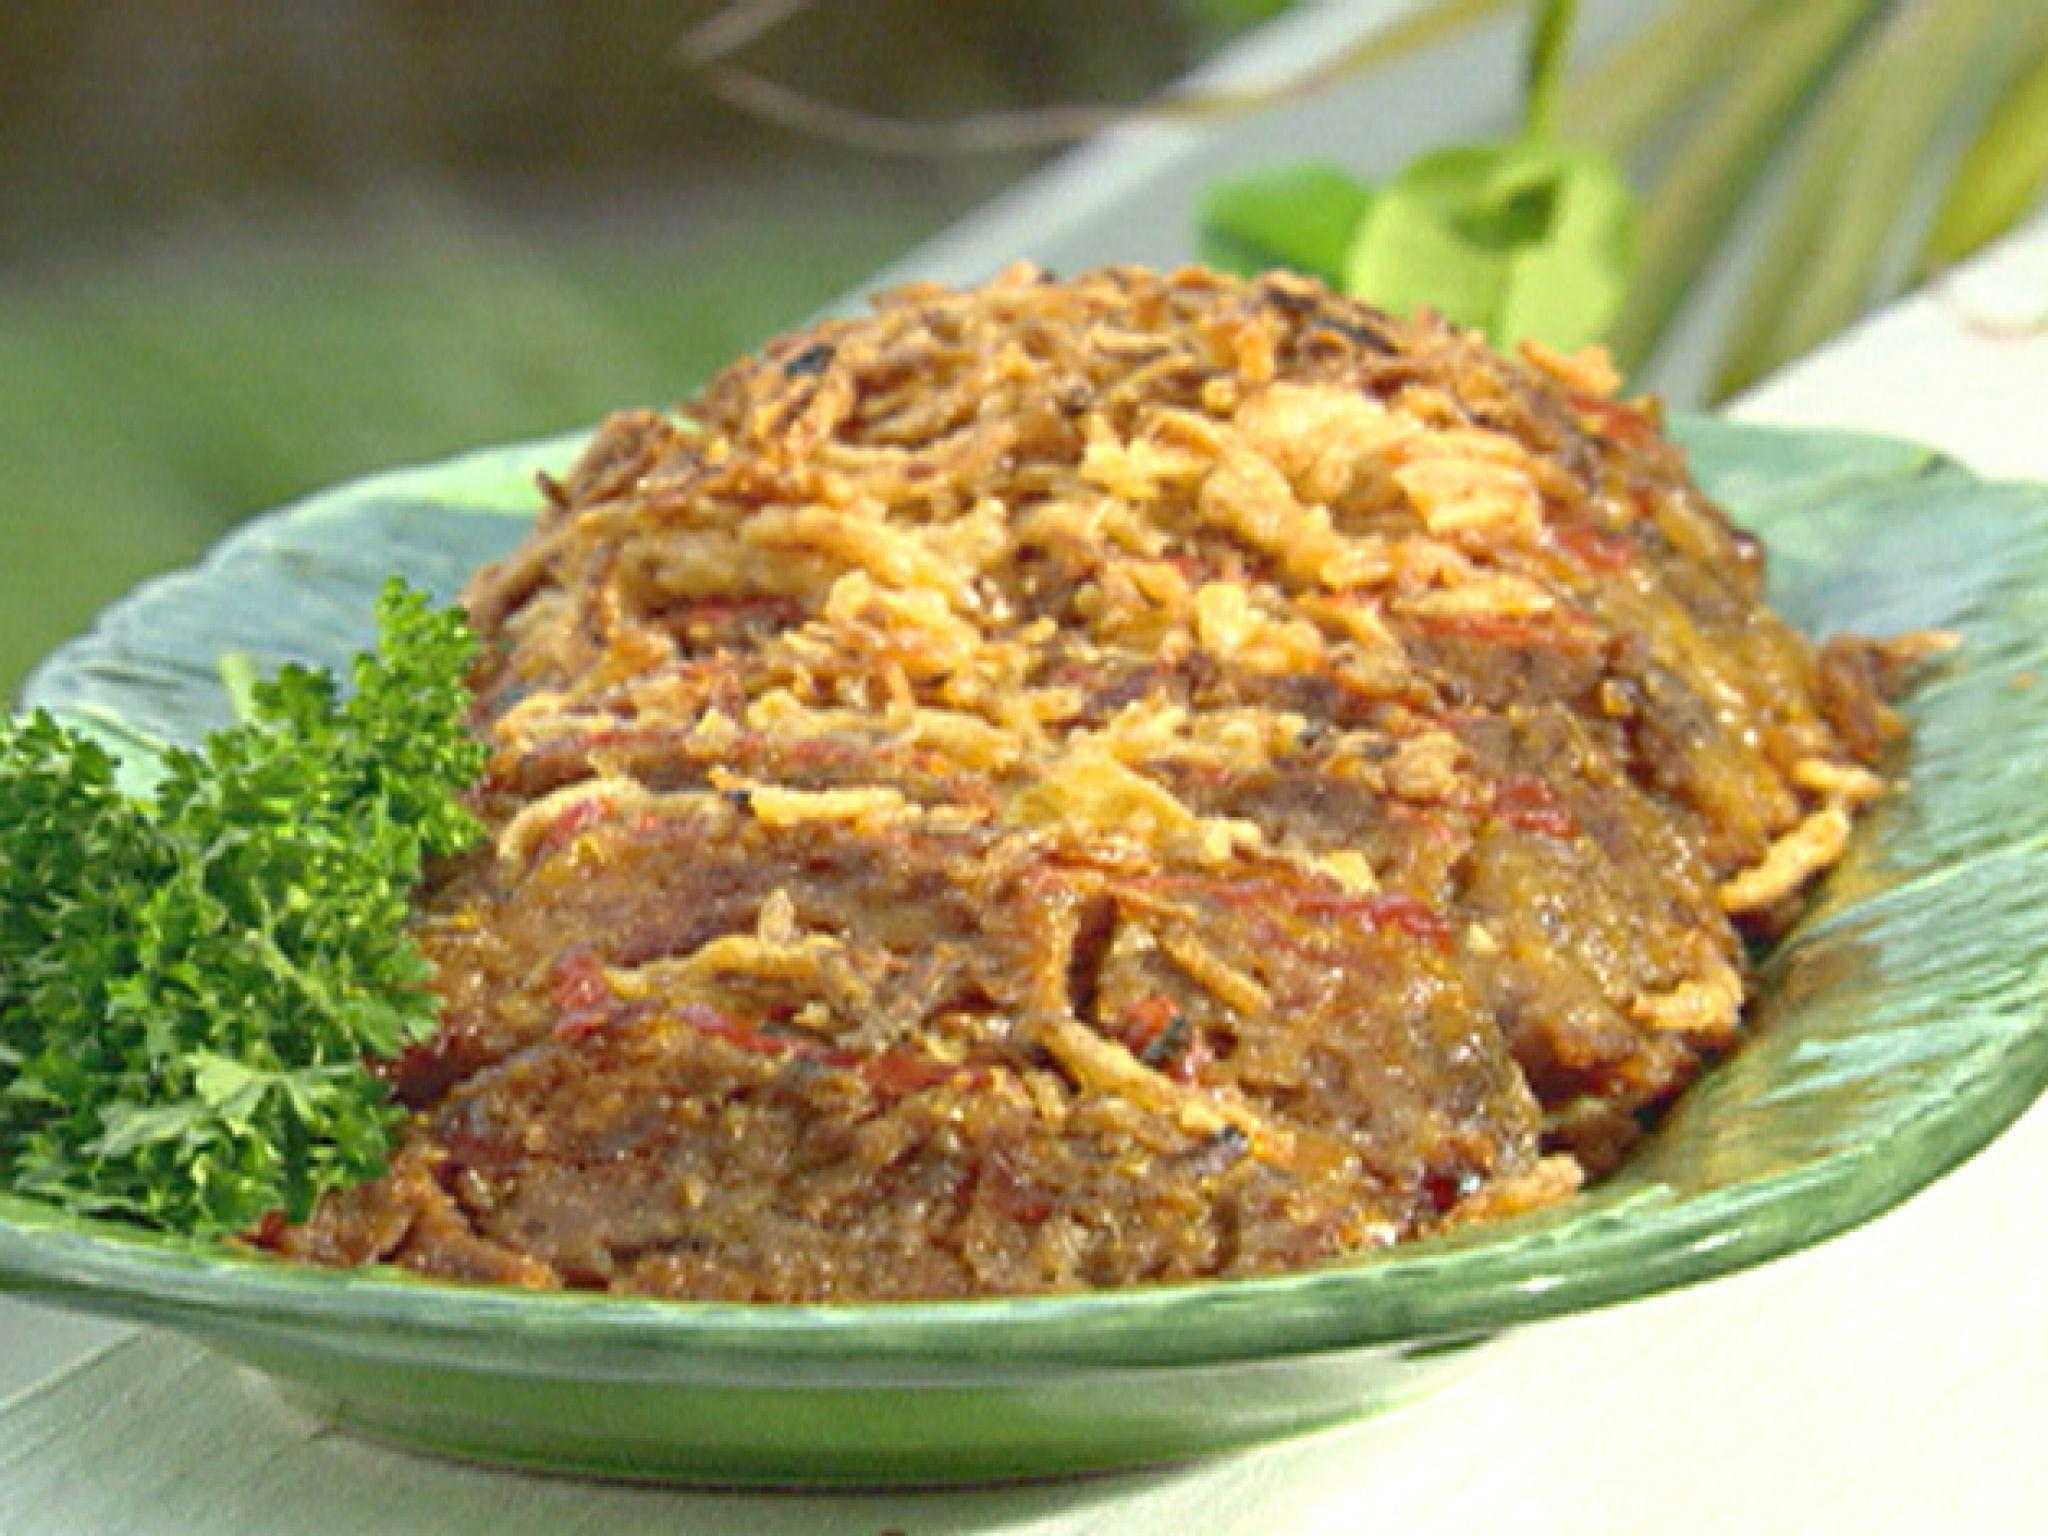 Best Meatloaf Recipe Food Network  best meatloaf recipe ever food network